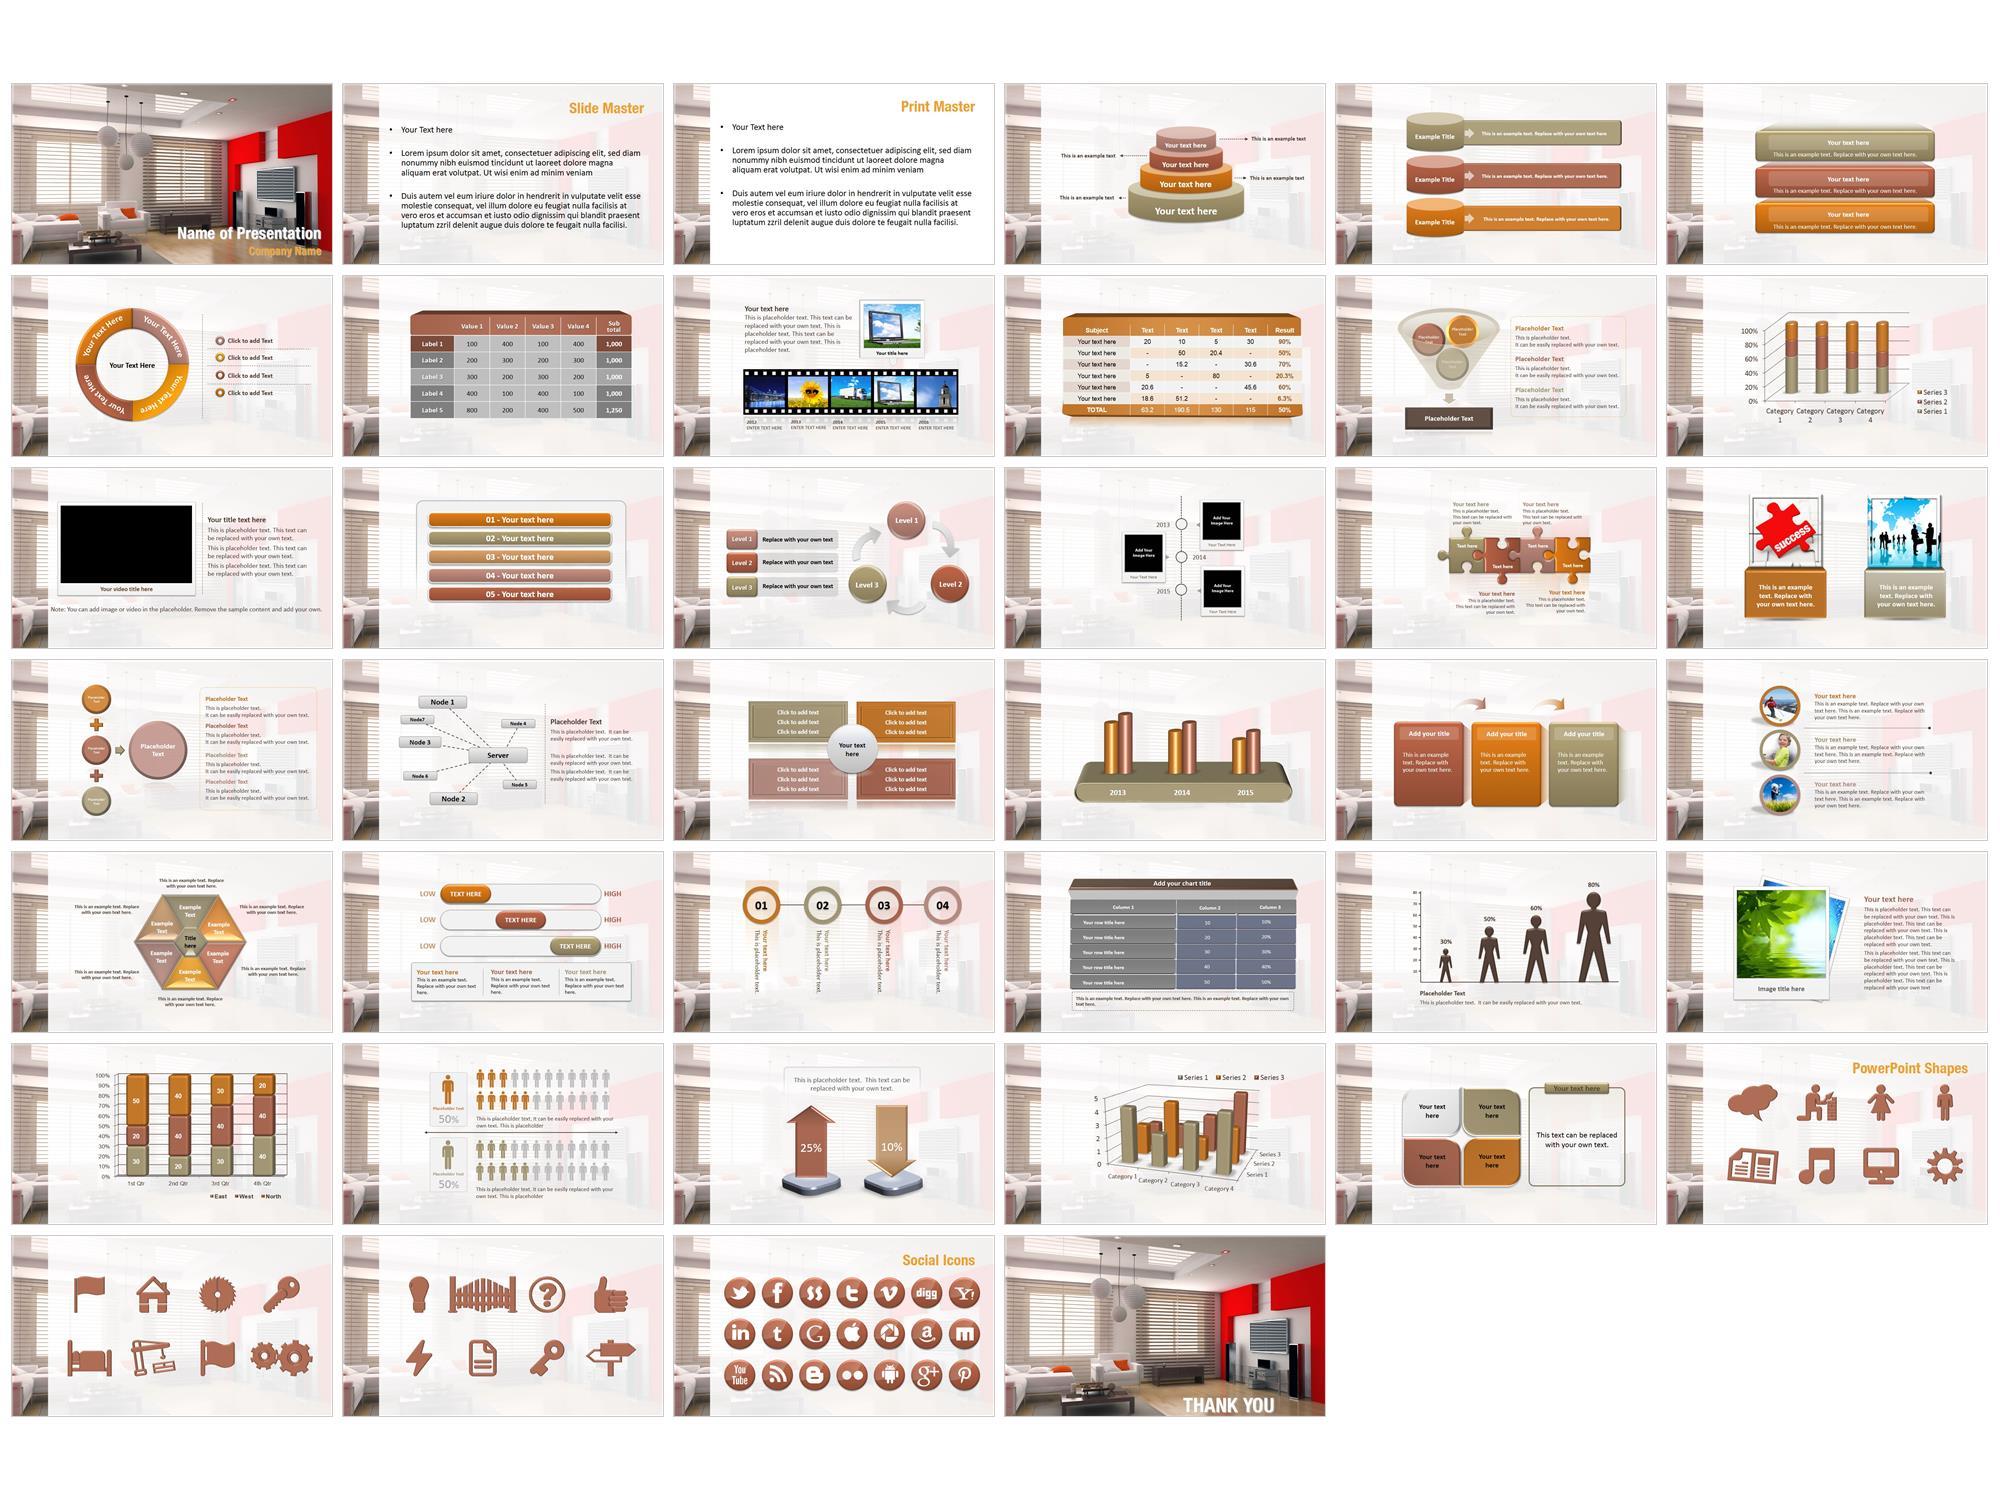 Modern Living Room PowerPoint Templates - Modern Living Room PowerPoint Backgrounds. Templates for PowerPoint. Presentation Templates. PowerPoint ...